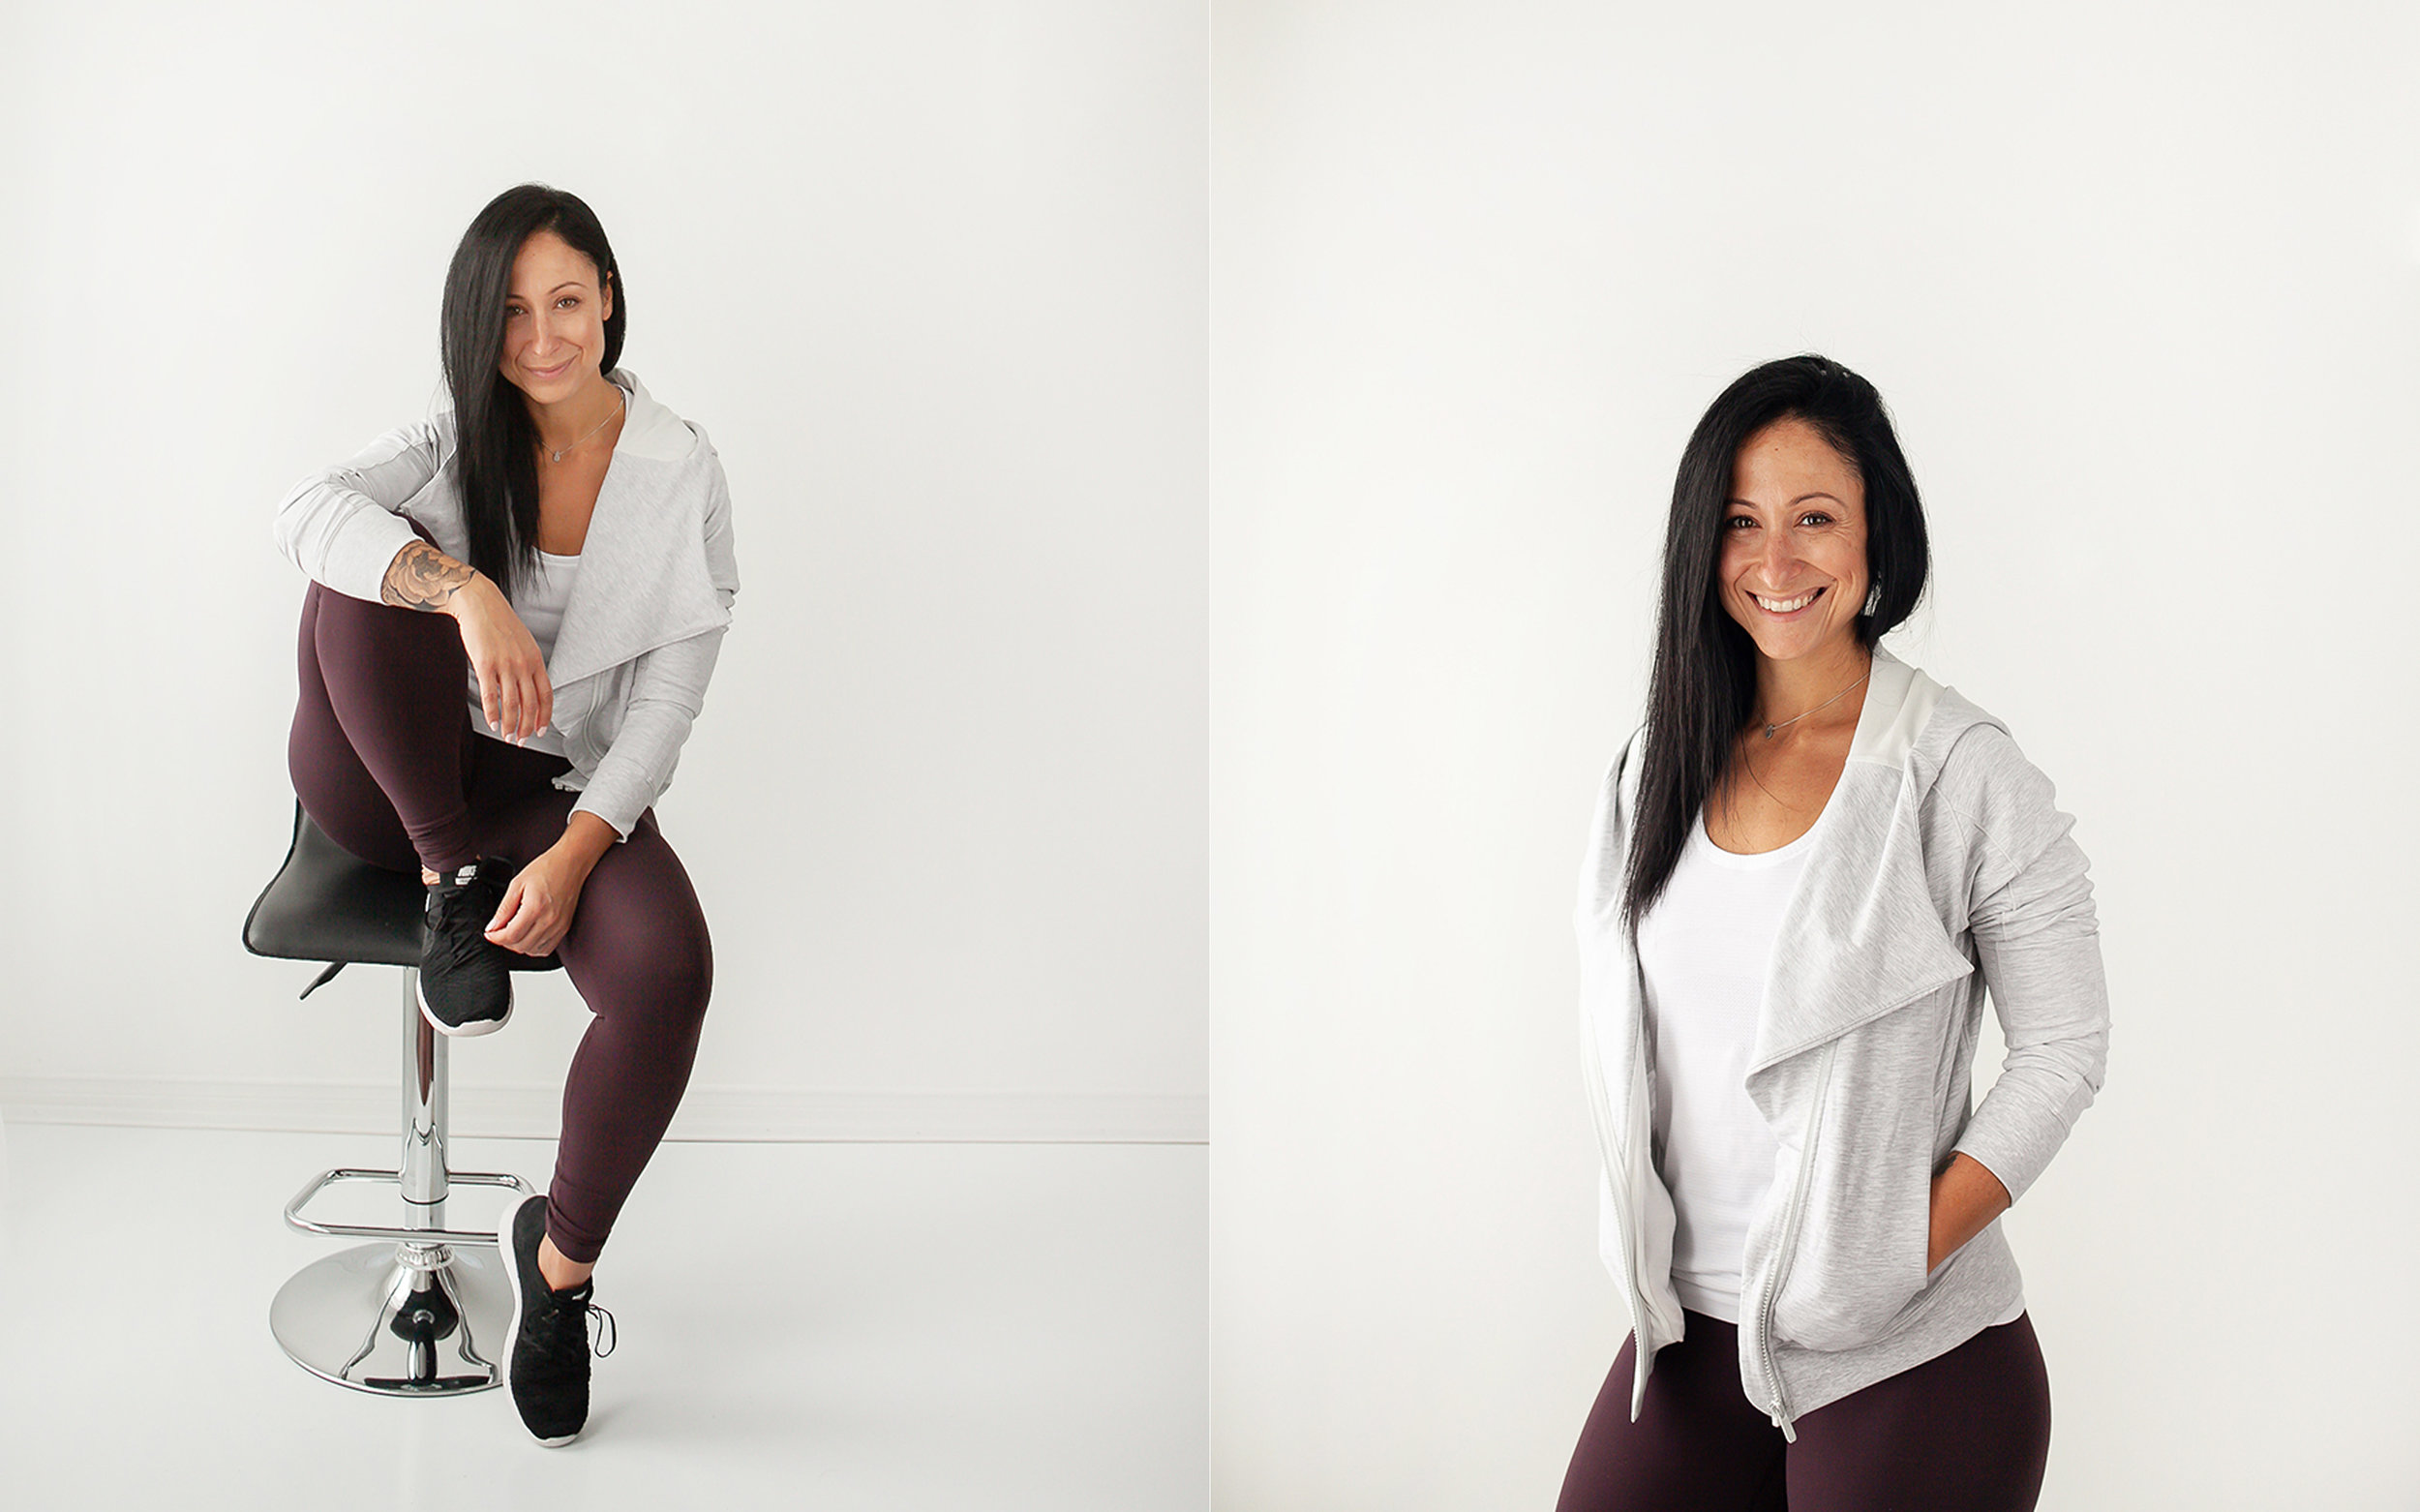 Branding_Fitness_Lifestyle_Headshots_Oshawa_Bradford_Petra_King_Photography.jpg